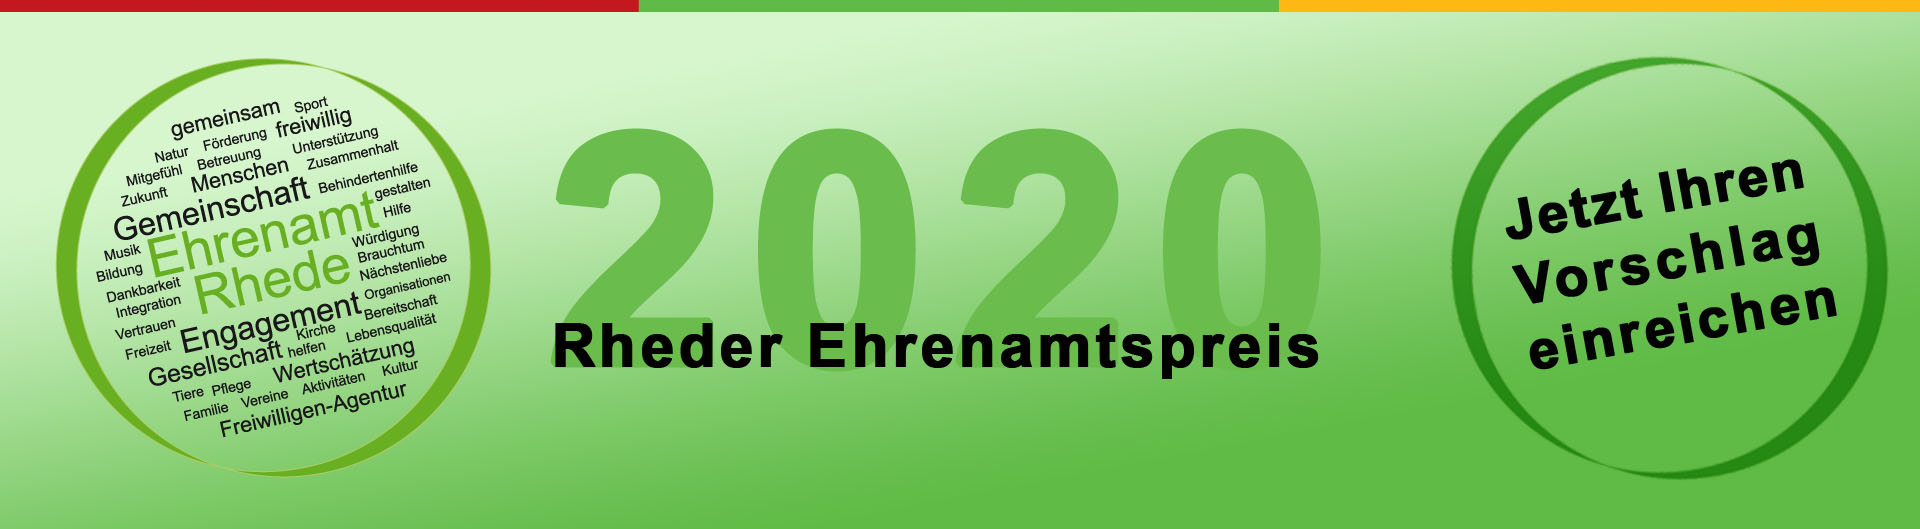 Ehrenamtspreis 2020